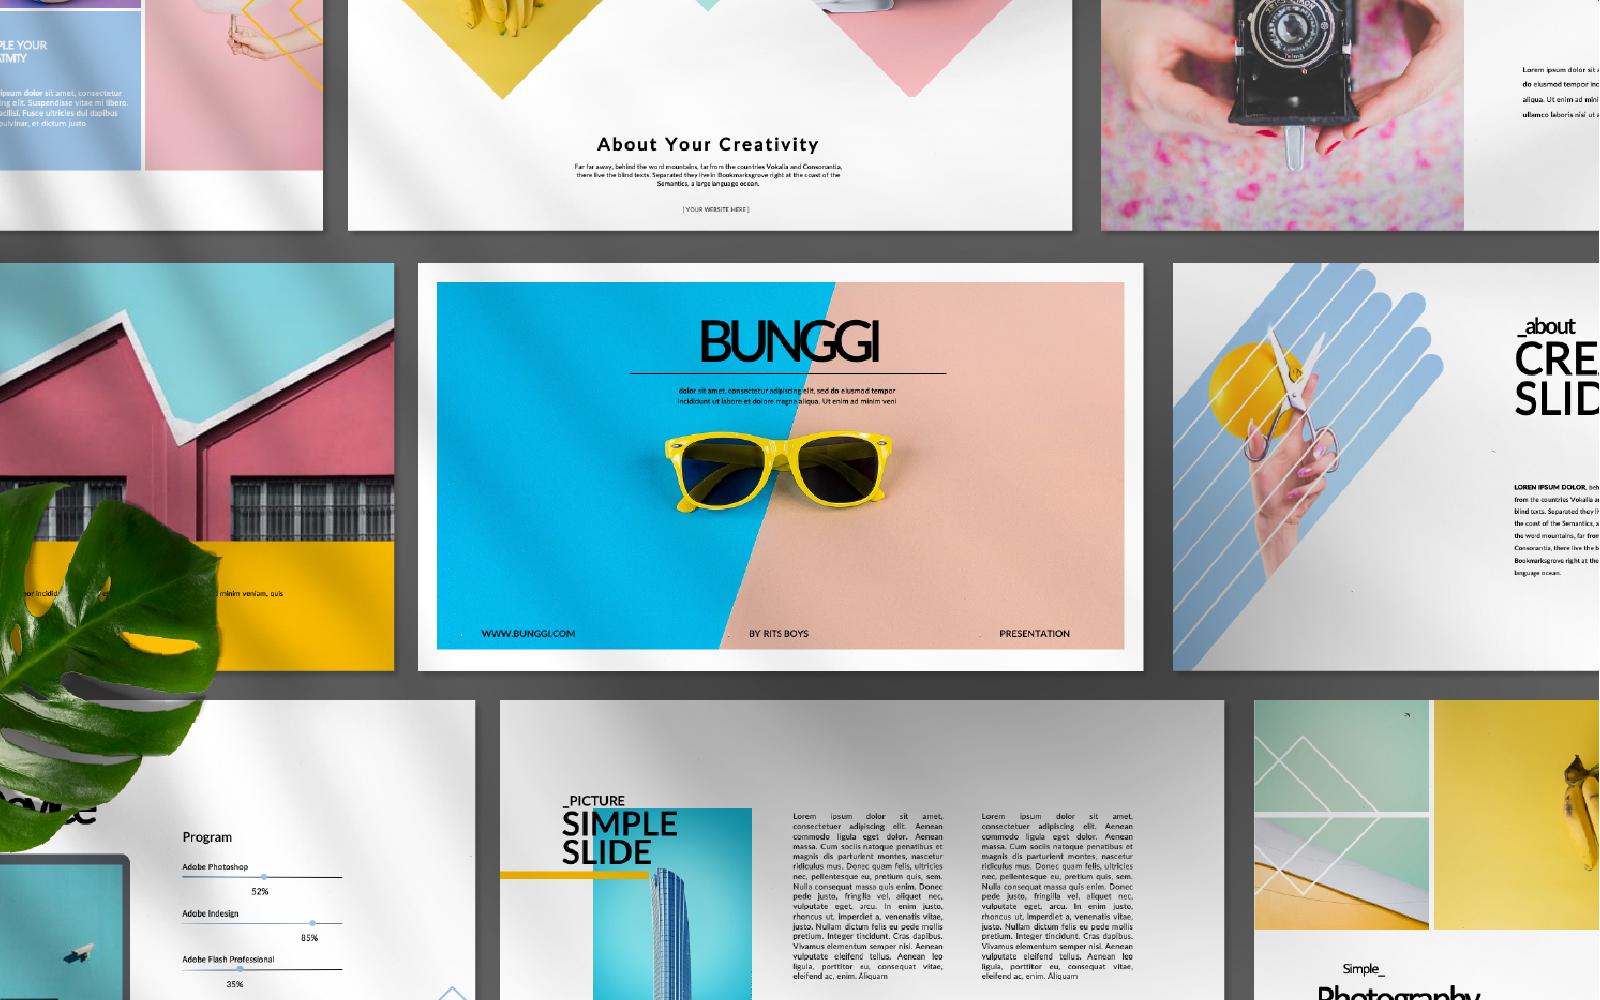 Bunggi Presentation PowerPoint Template